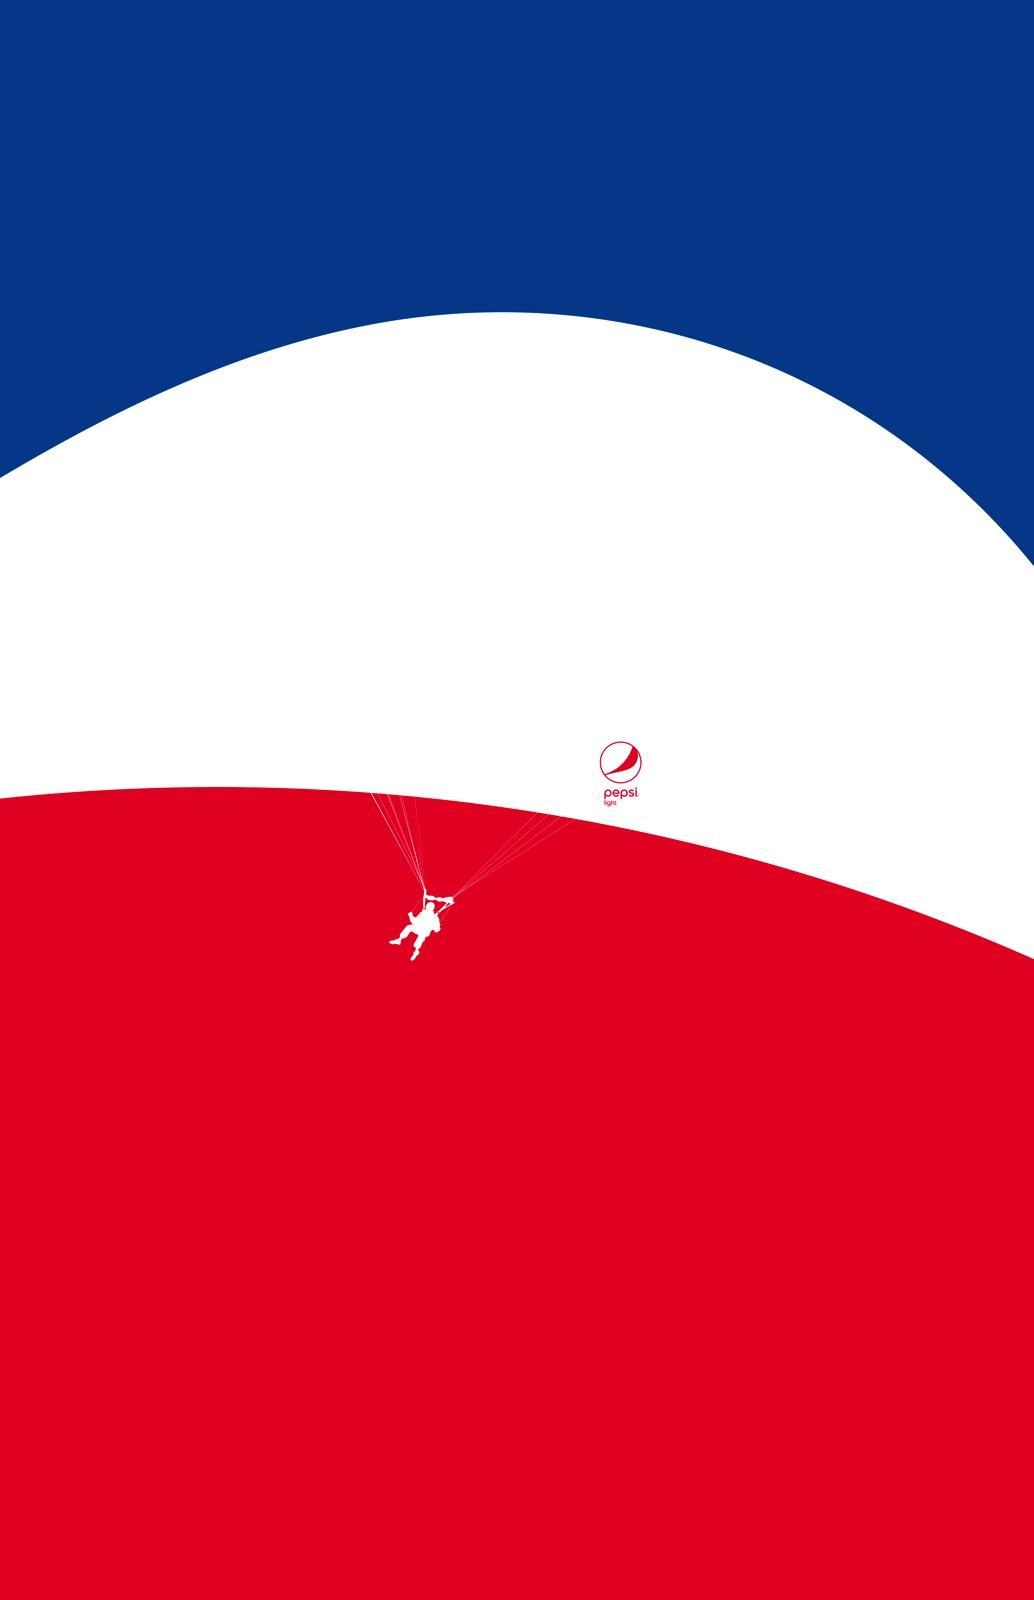 Pepsi Print Ad - Feel Light - Parachute